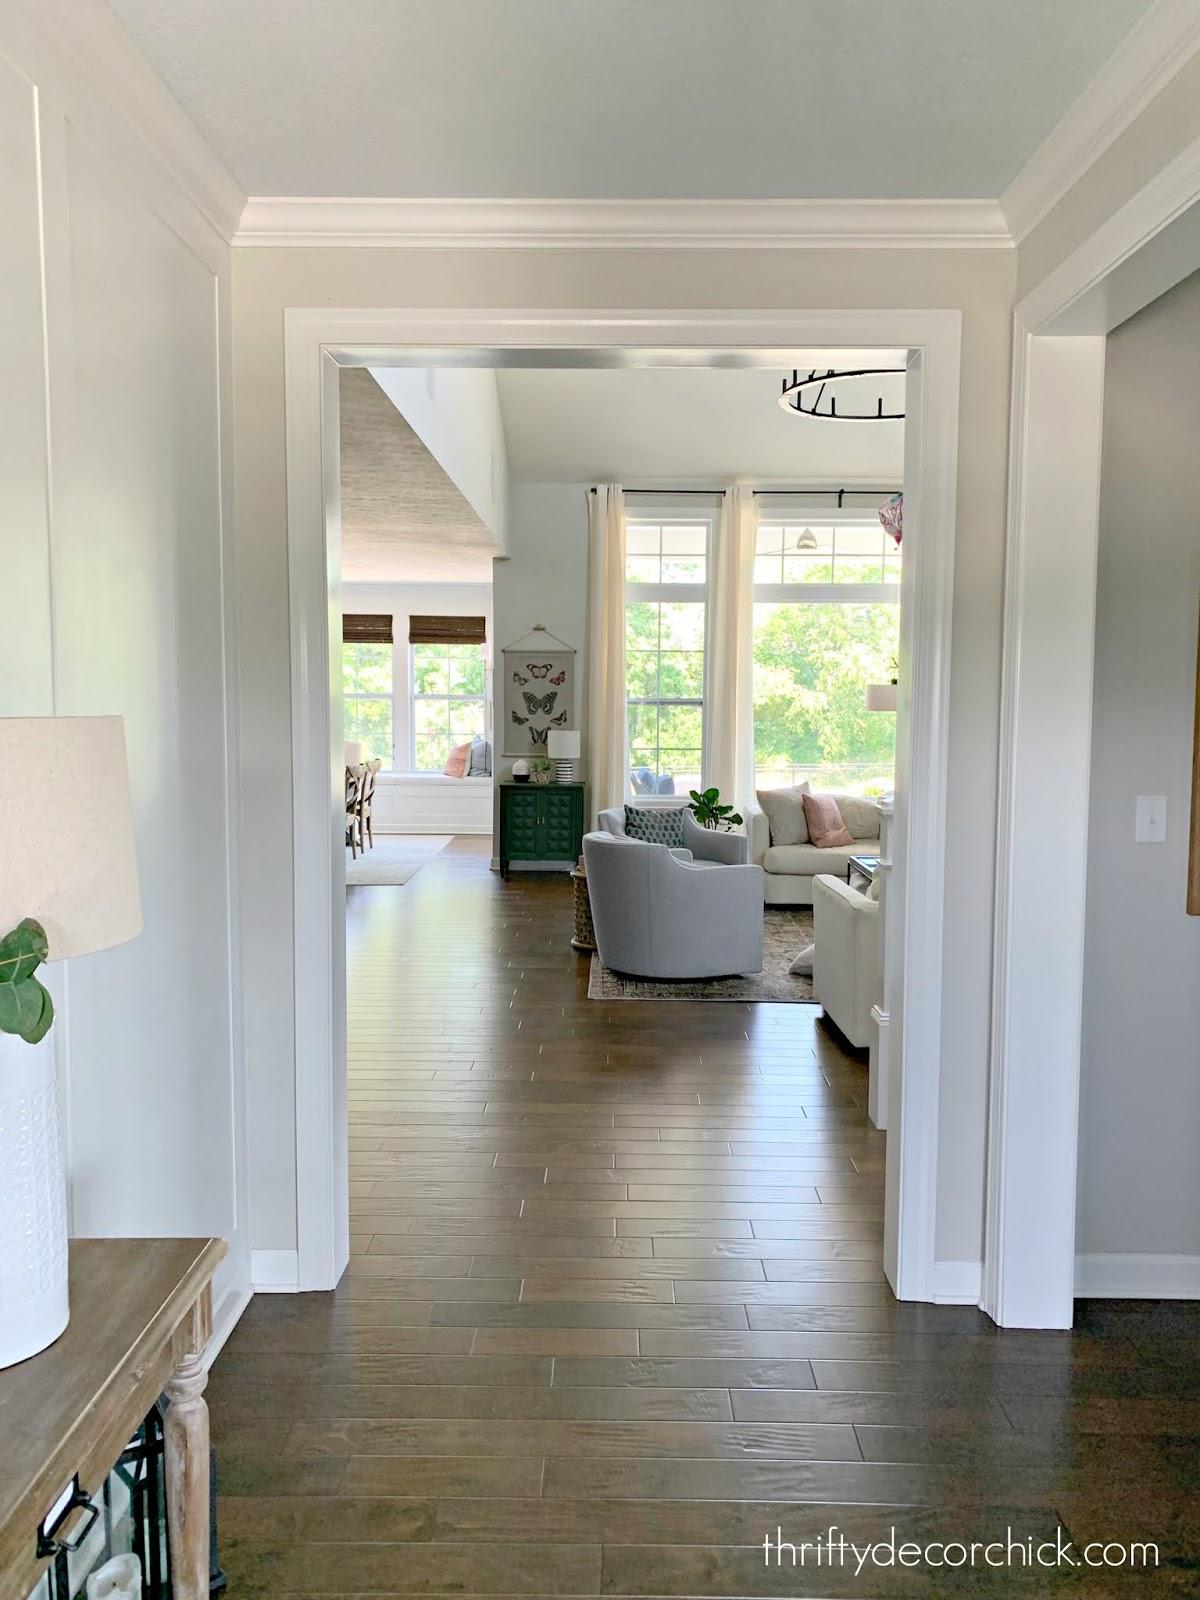 Replacing thin trim around doors